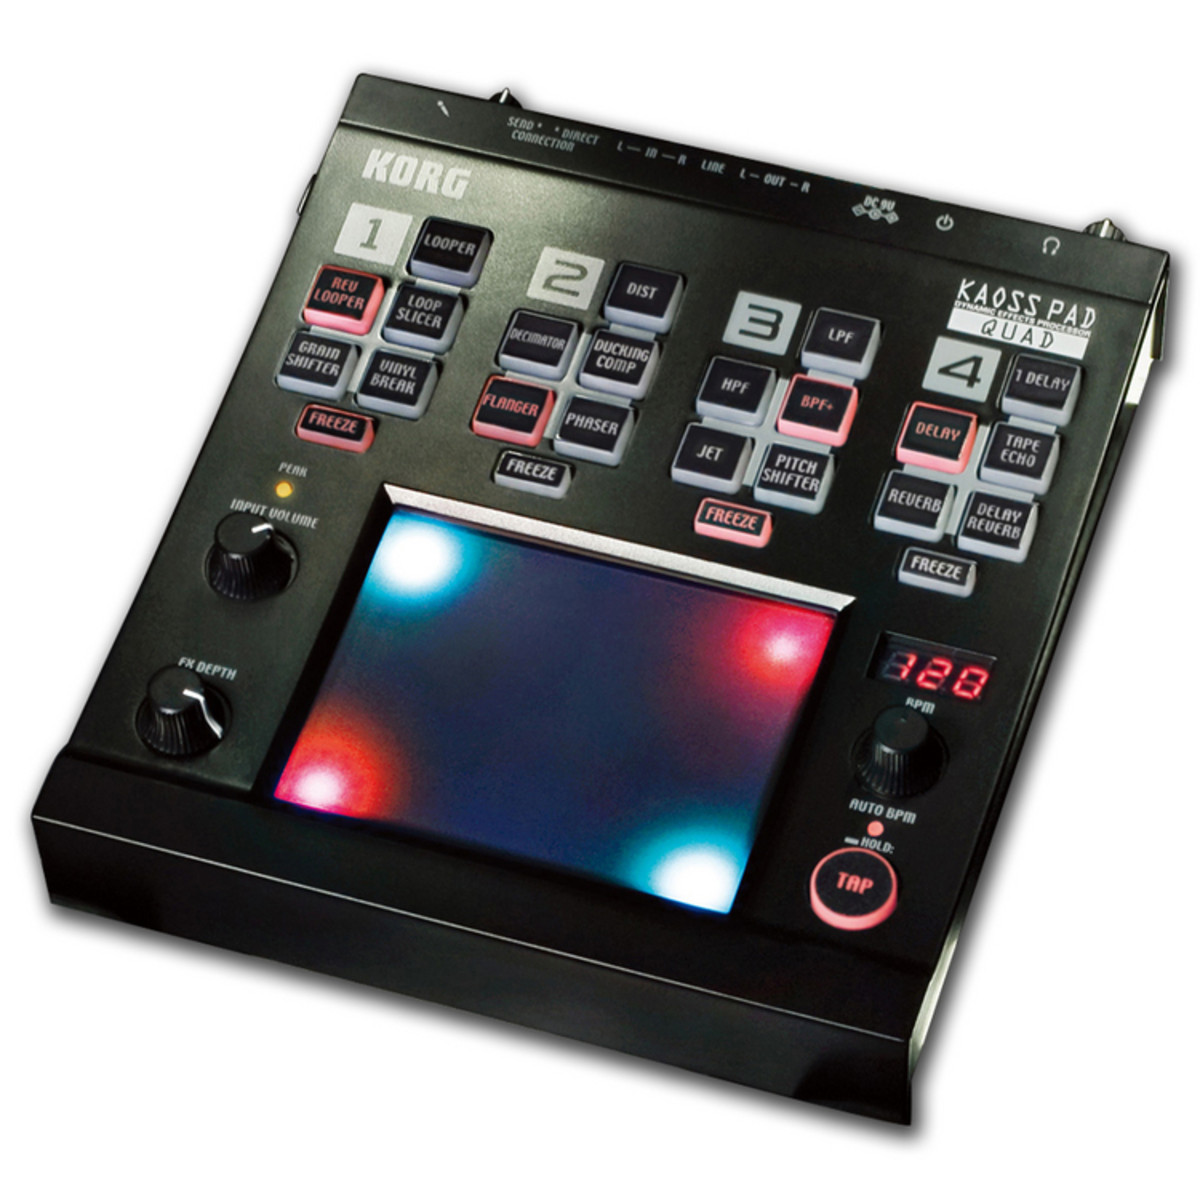 disc korg kaoss pad quad dynamic effects processor at gear4music. Black Bedroom Furniture Sets. Home Design Ideas